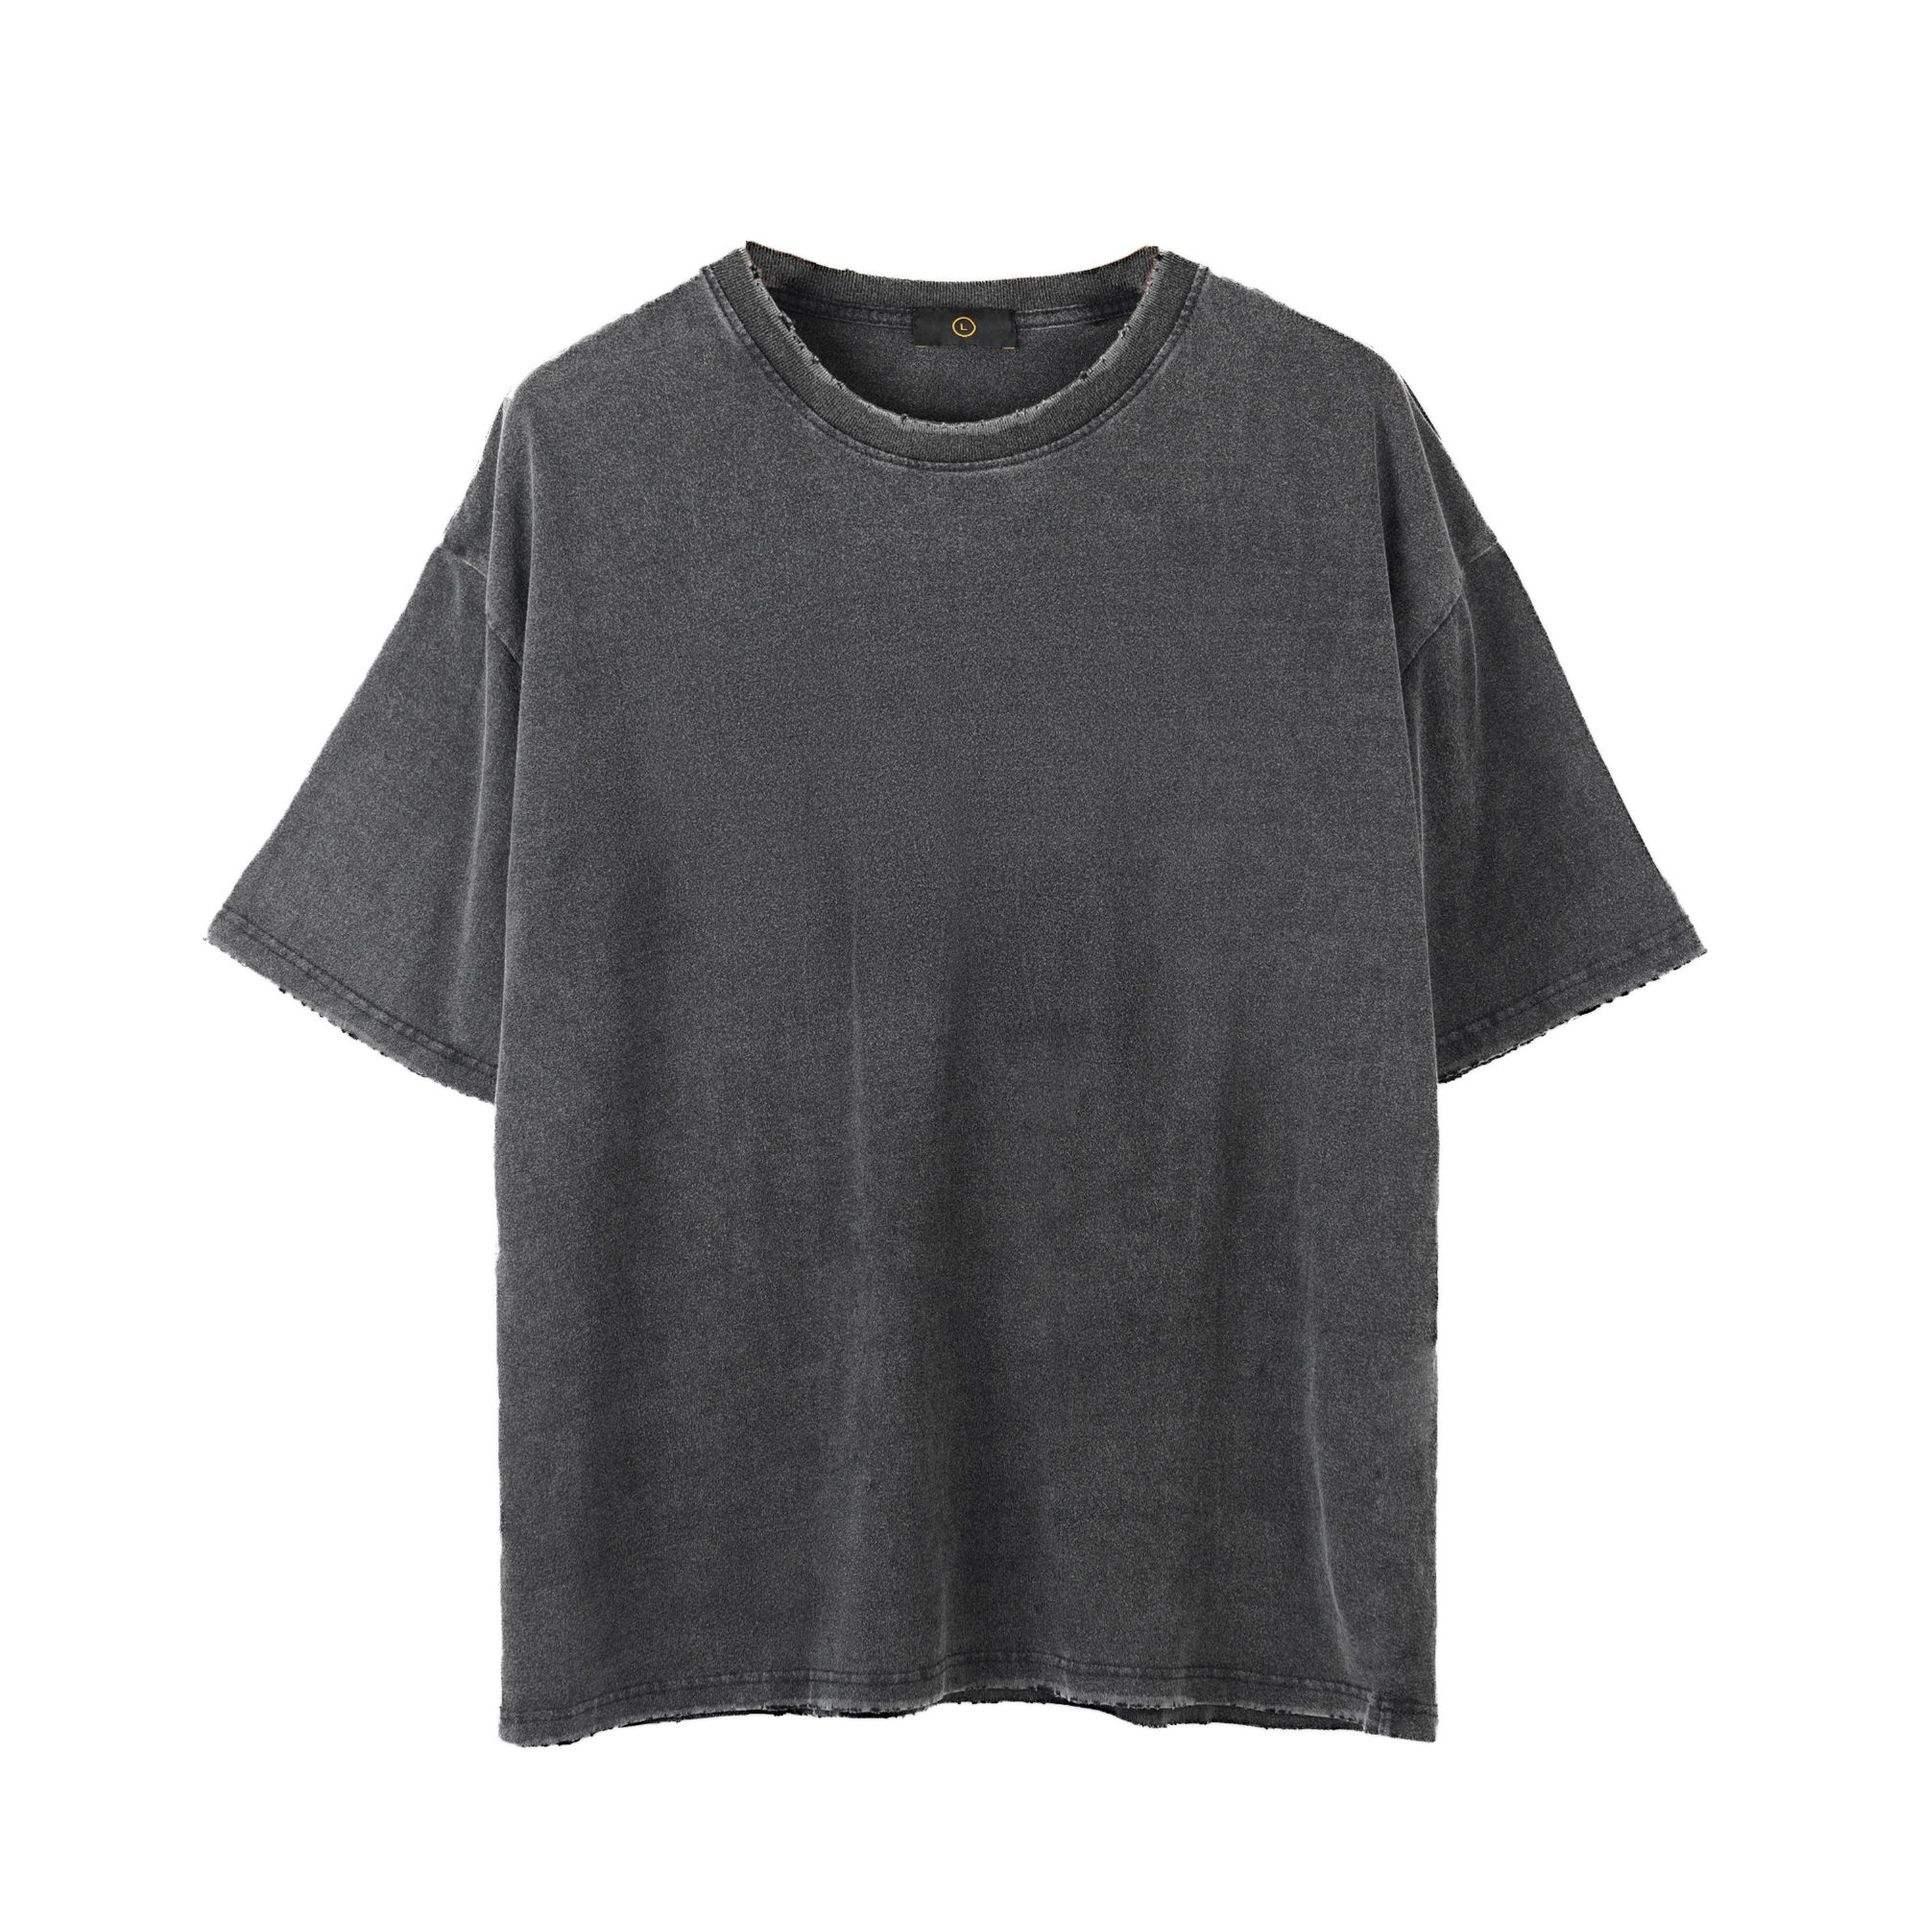 2020 new Design oversize Tee Black T Shirt Hip Hop vintage washed tshirts mens custom logo blank T-shirt